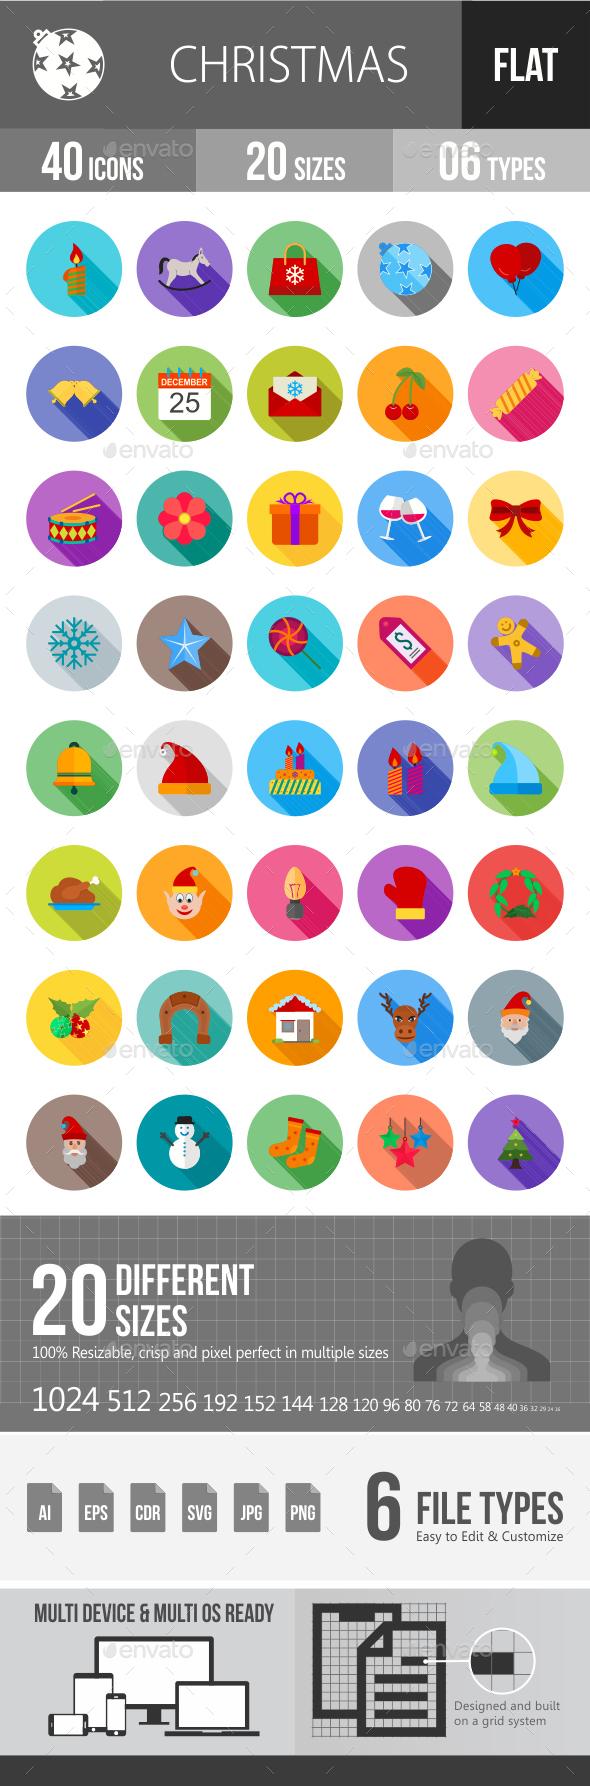 Christmas Flat Shadowed Icons - Icons